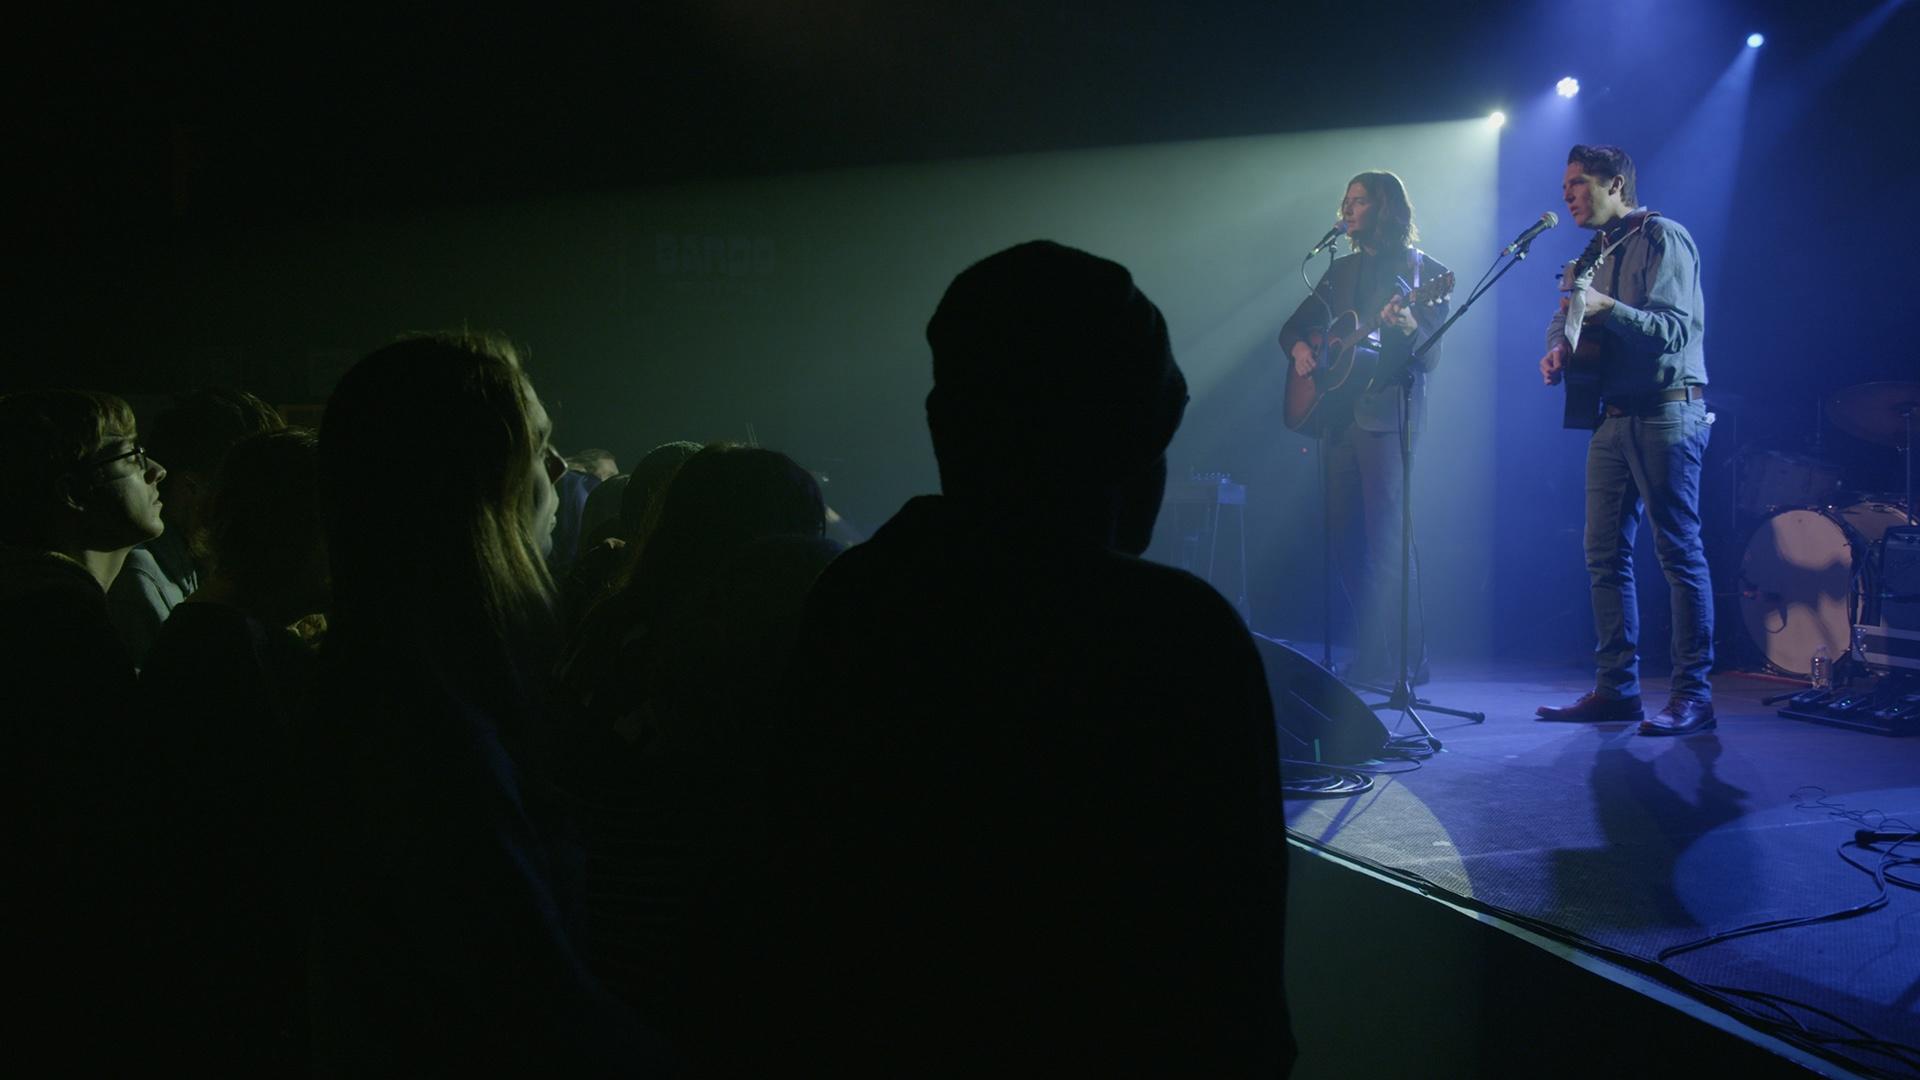 Milk Carton Kids perform live at Higher Ground